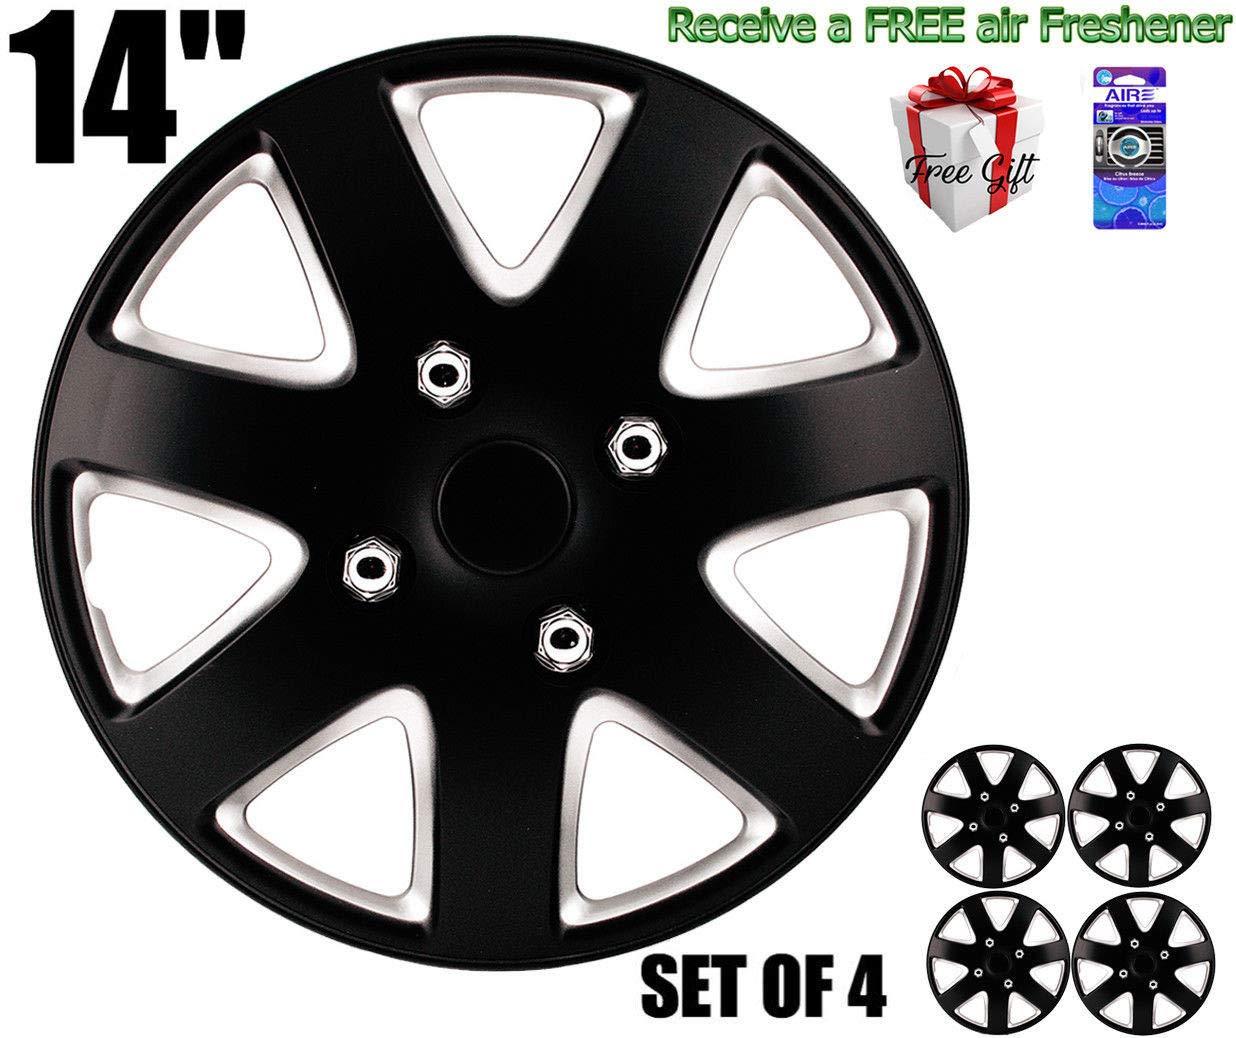 Amazon.com: SUMEX 50589BS Universal Fit Silverstone Wheel Trims 13-inch - Black/Silver Set of 4: Automotive